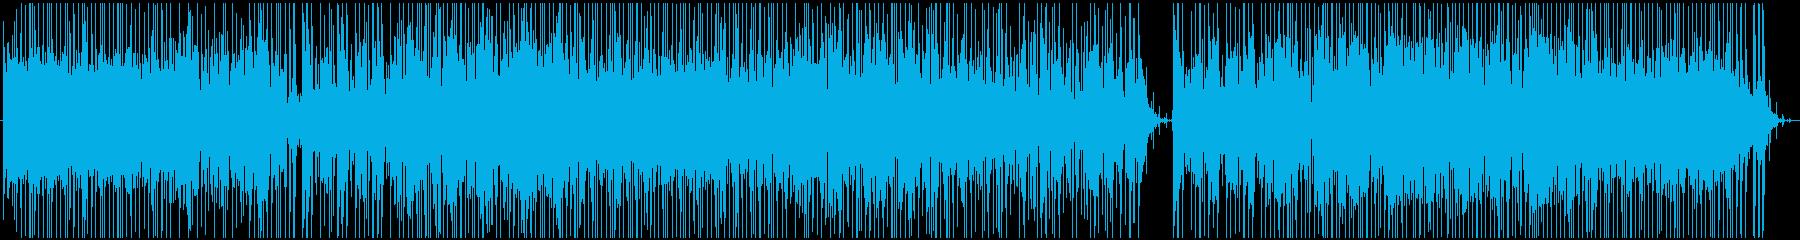 KYOTOの再生済みの波形